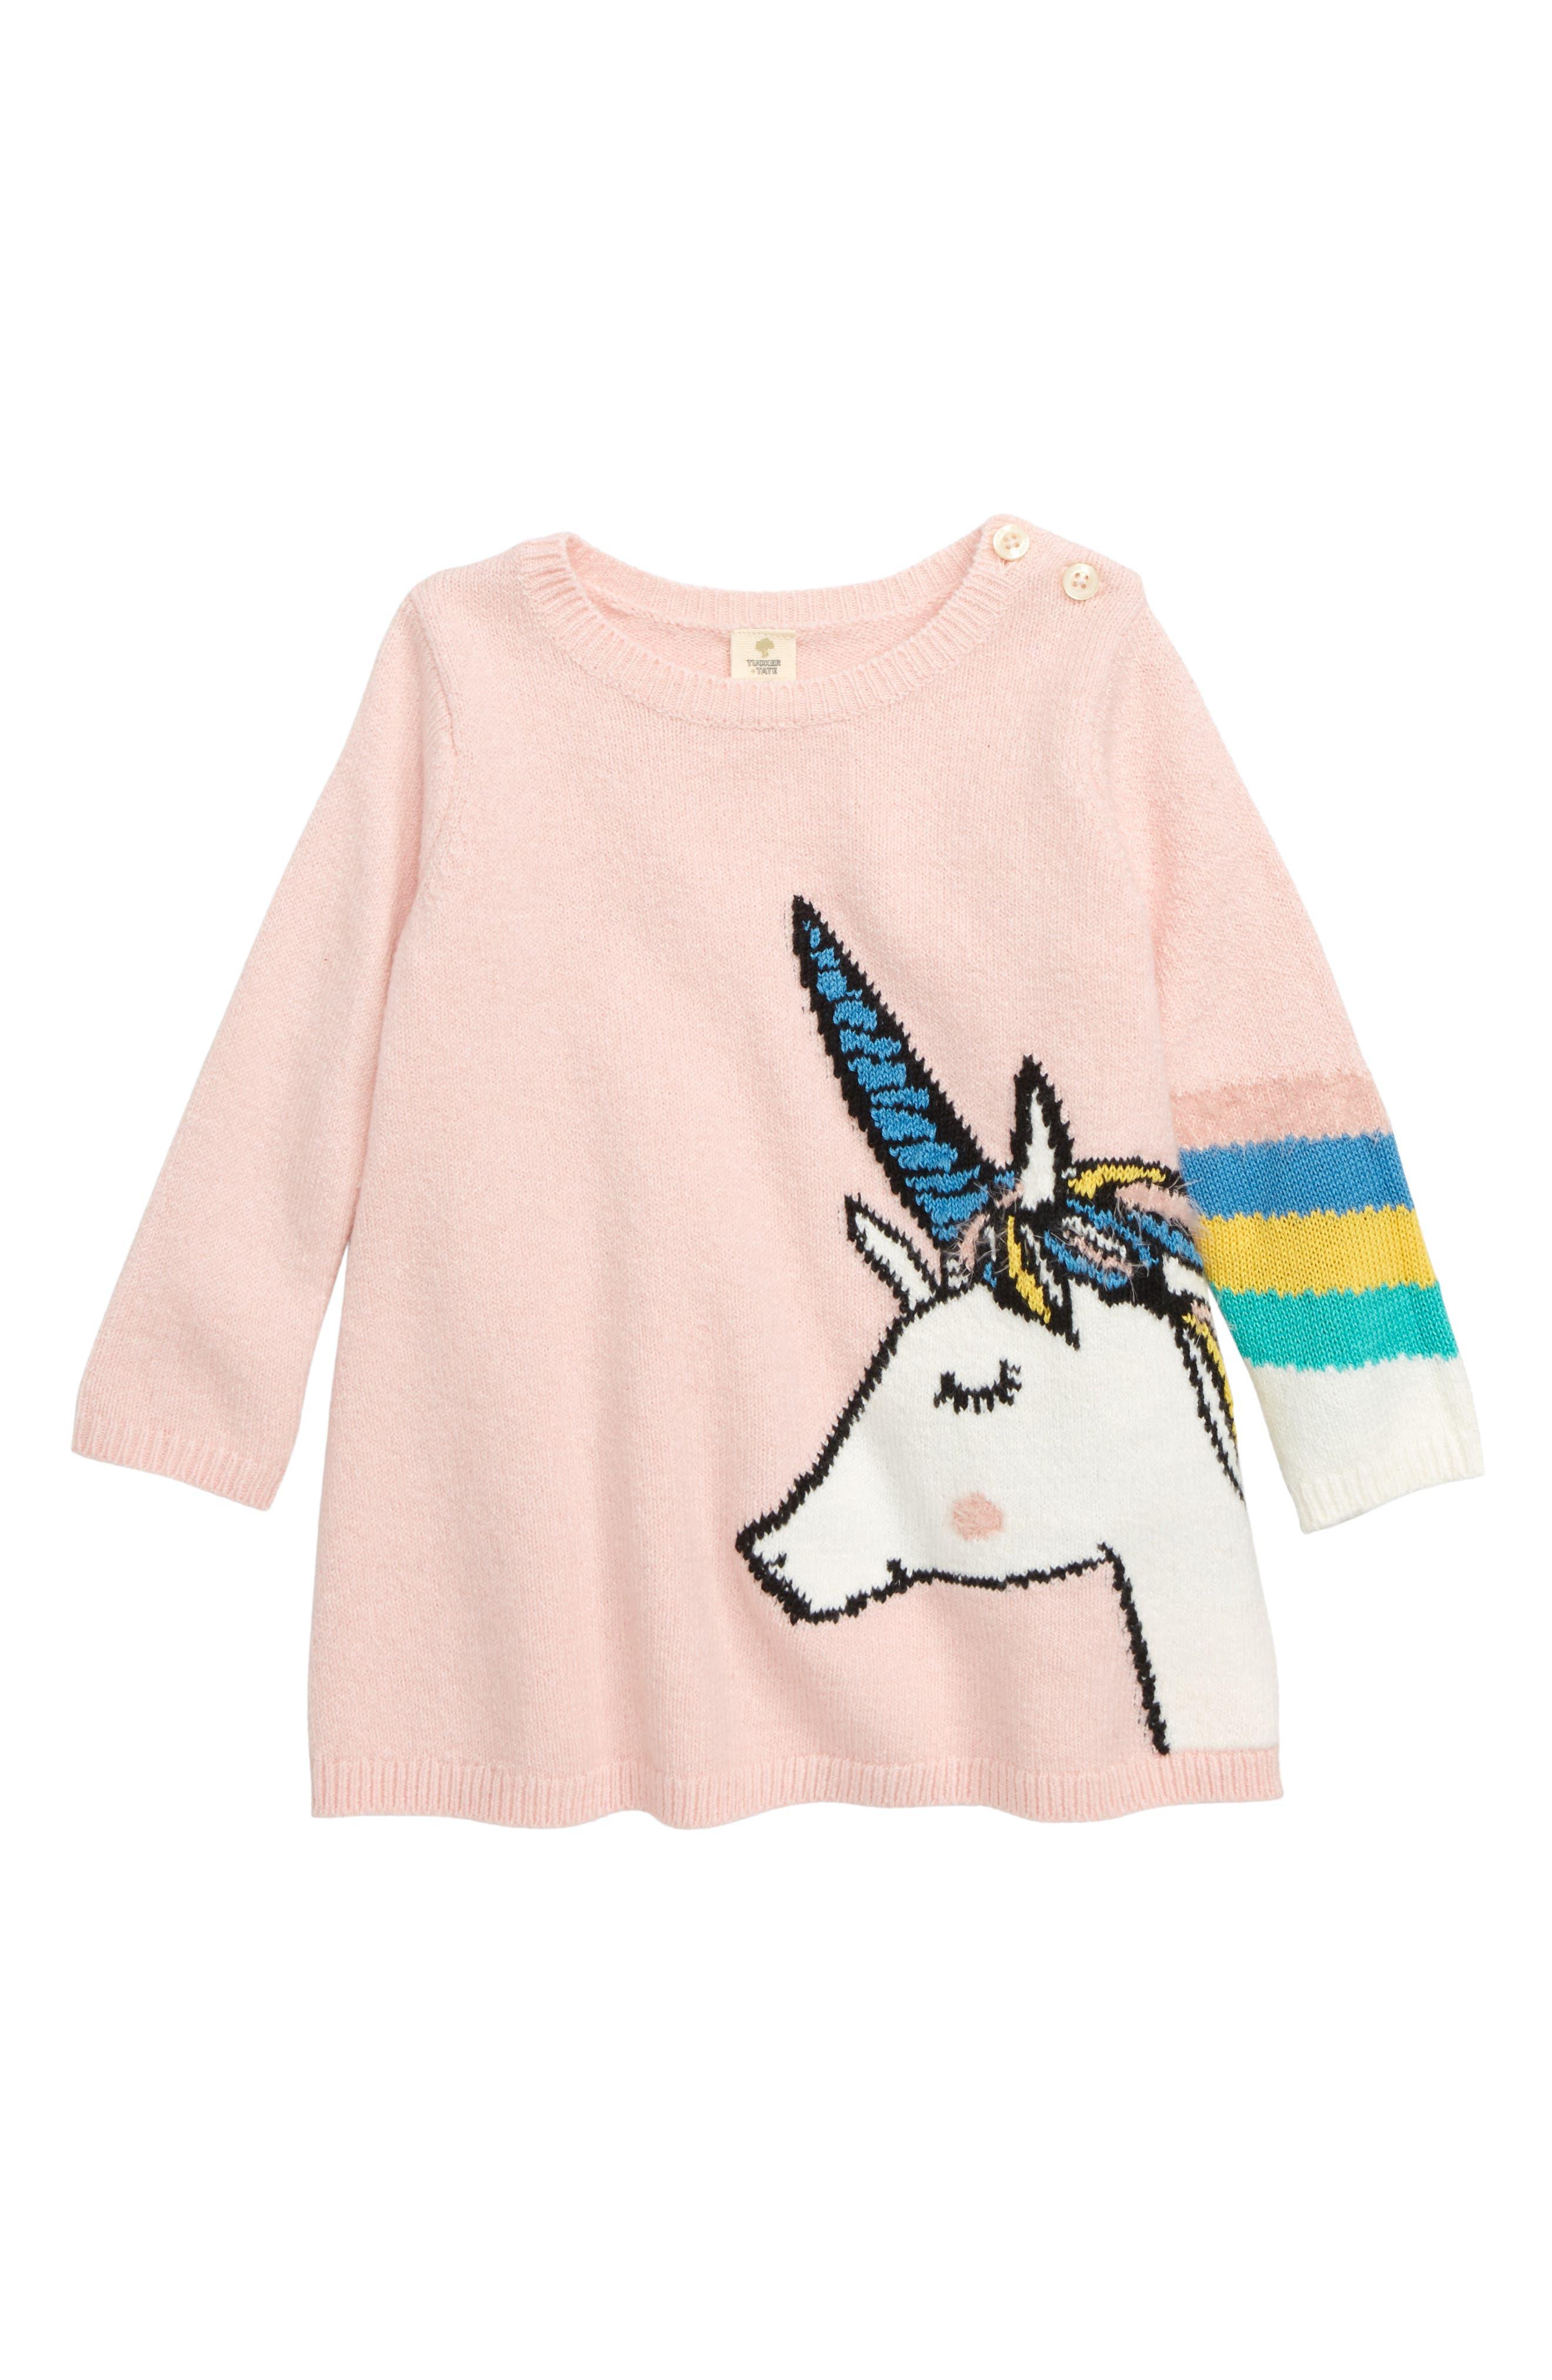 TUCKER + TATE,                             Unicorn Sweater Dress,                             Main thumbnail 1, color,                             680